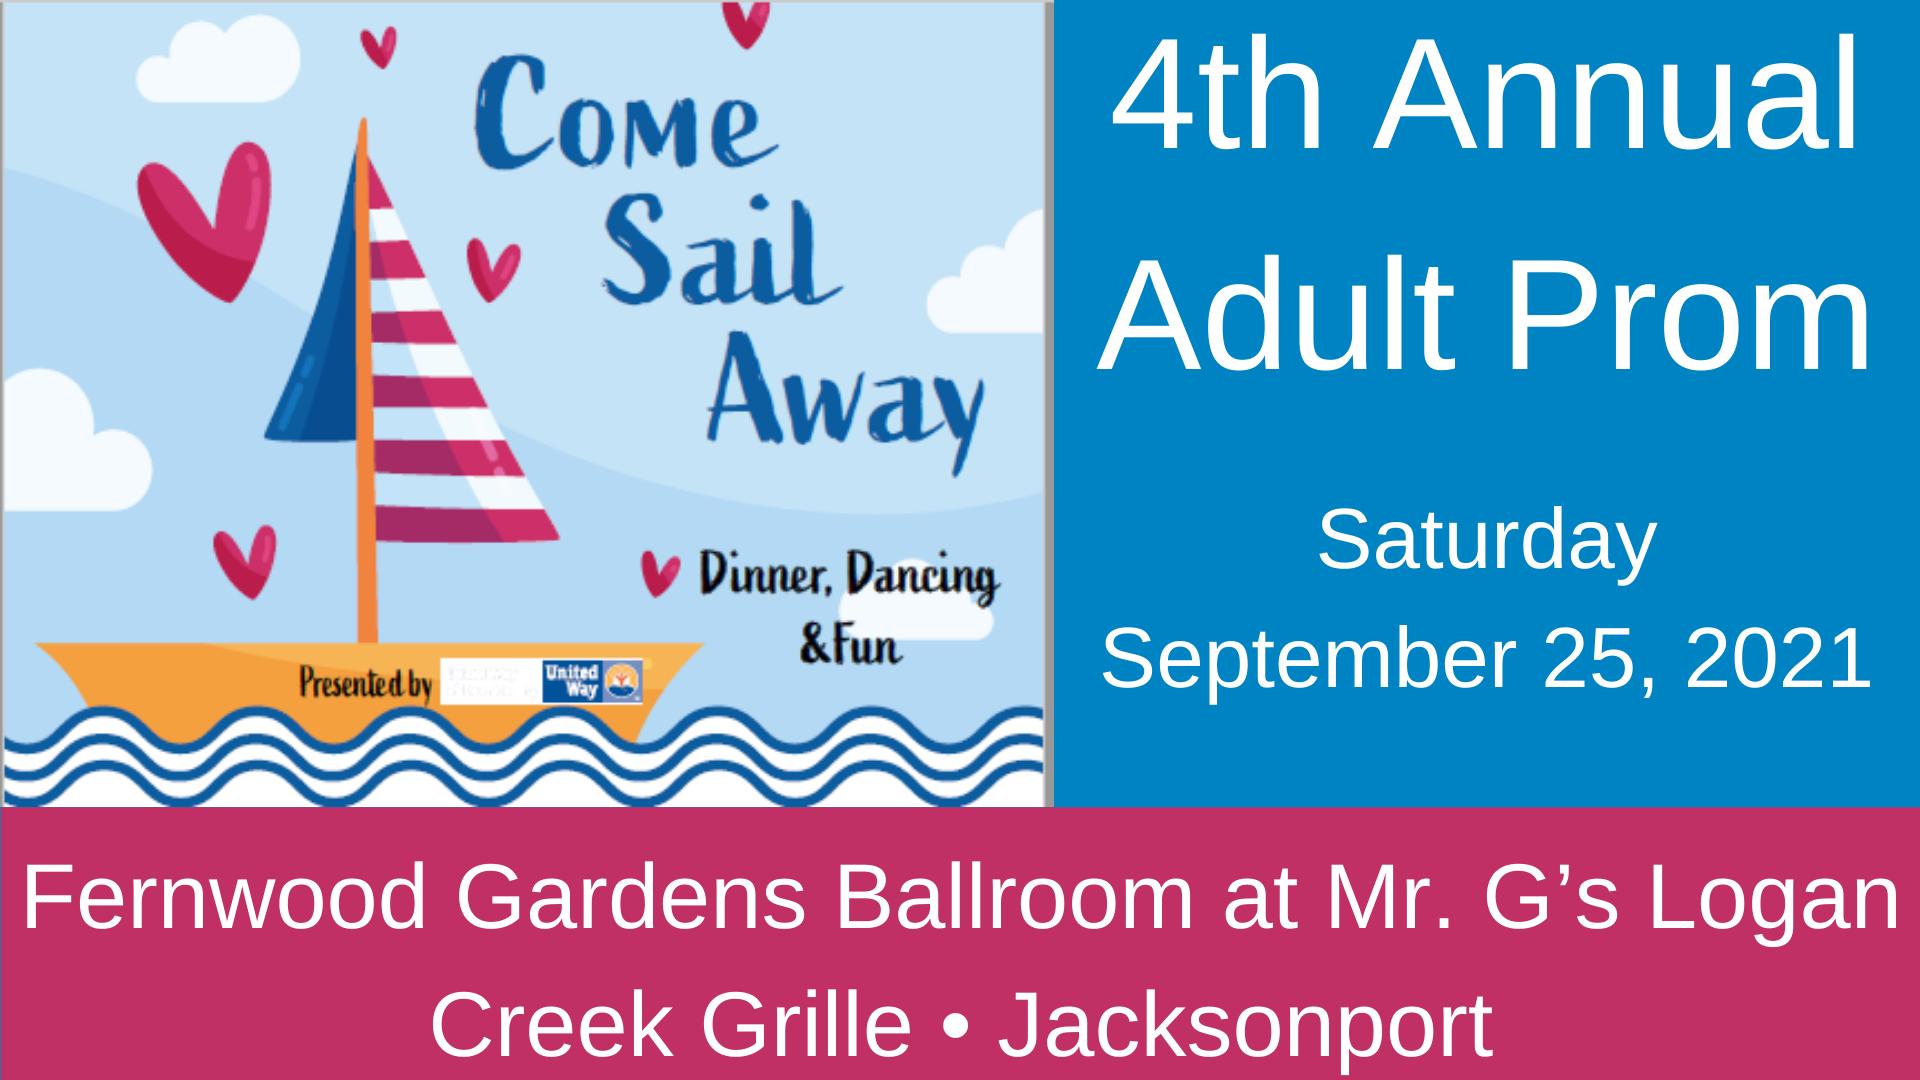 Come-Sail-Away-Event-Header